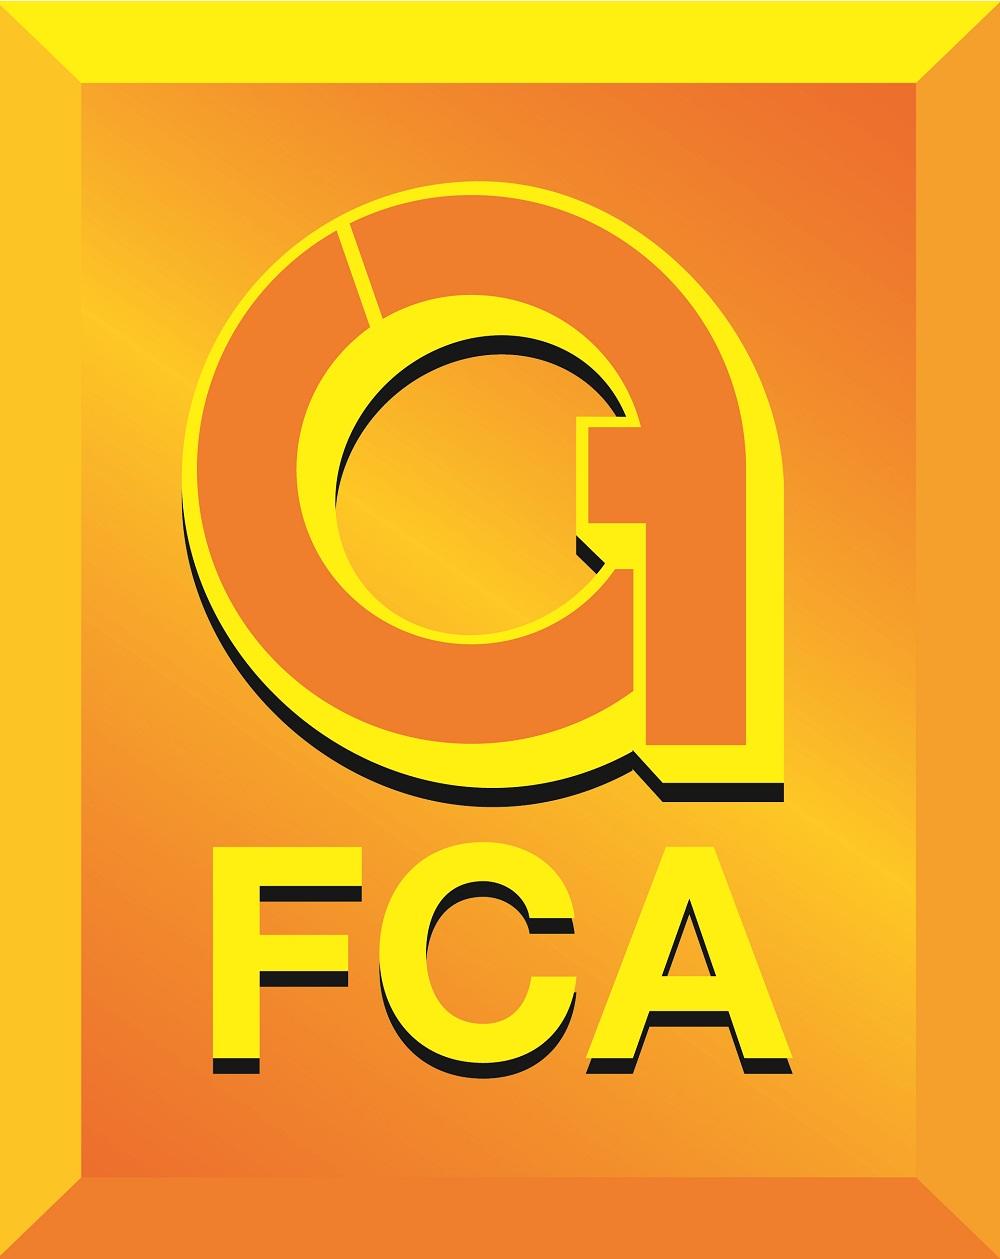 Logo da FCA